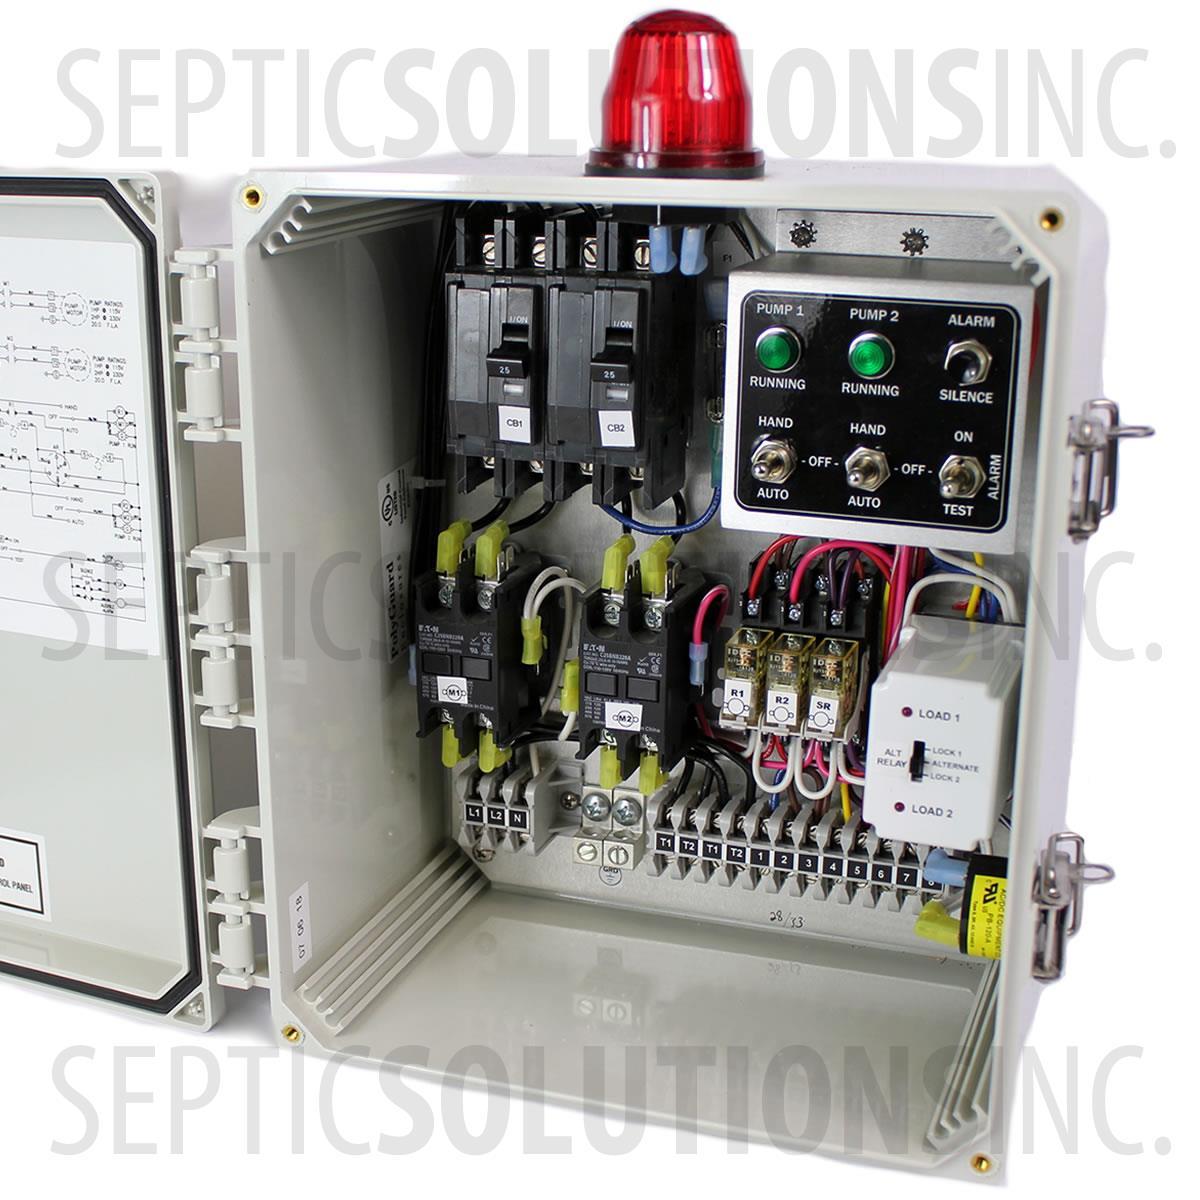 small resolution of duplex pump control panel schematic low level switch motor sje rhombus wiring diagram panels sje control rhombus 1121w120h16b17c